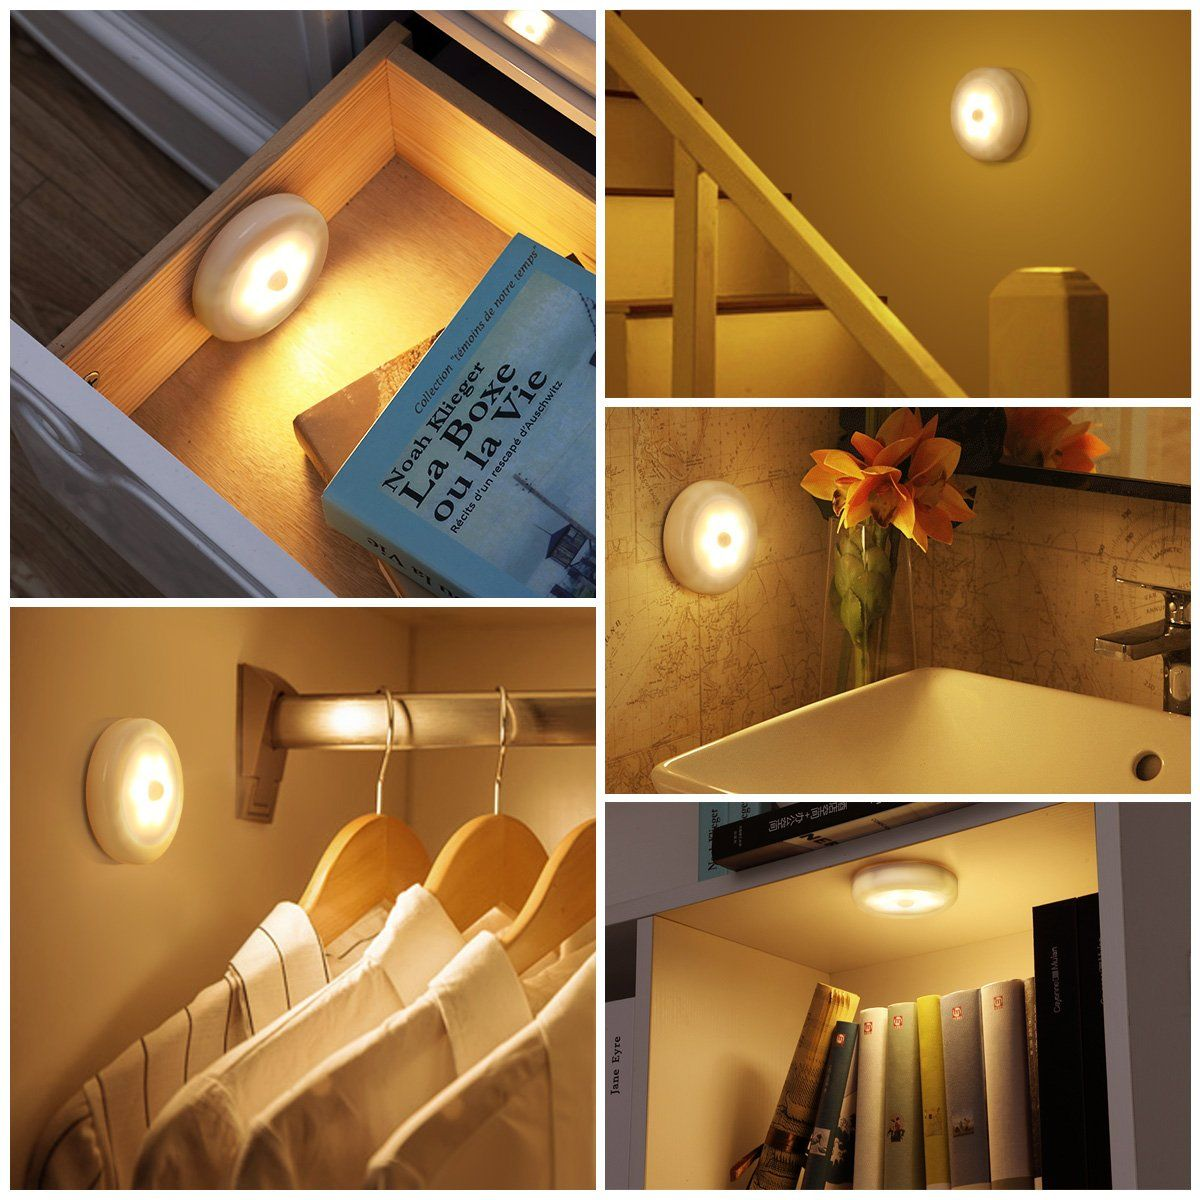 Amir Motion Sensor Light Cordless Batterypowered Led Night Light Stickanywhere Closet Lights Stair Lights Safe Sensor Night Lights Led Night Light Night Light